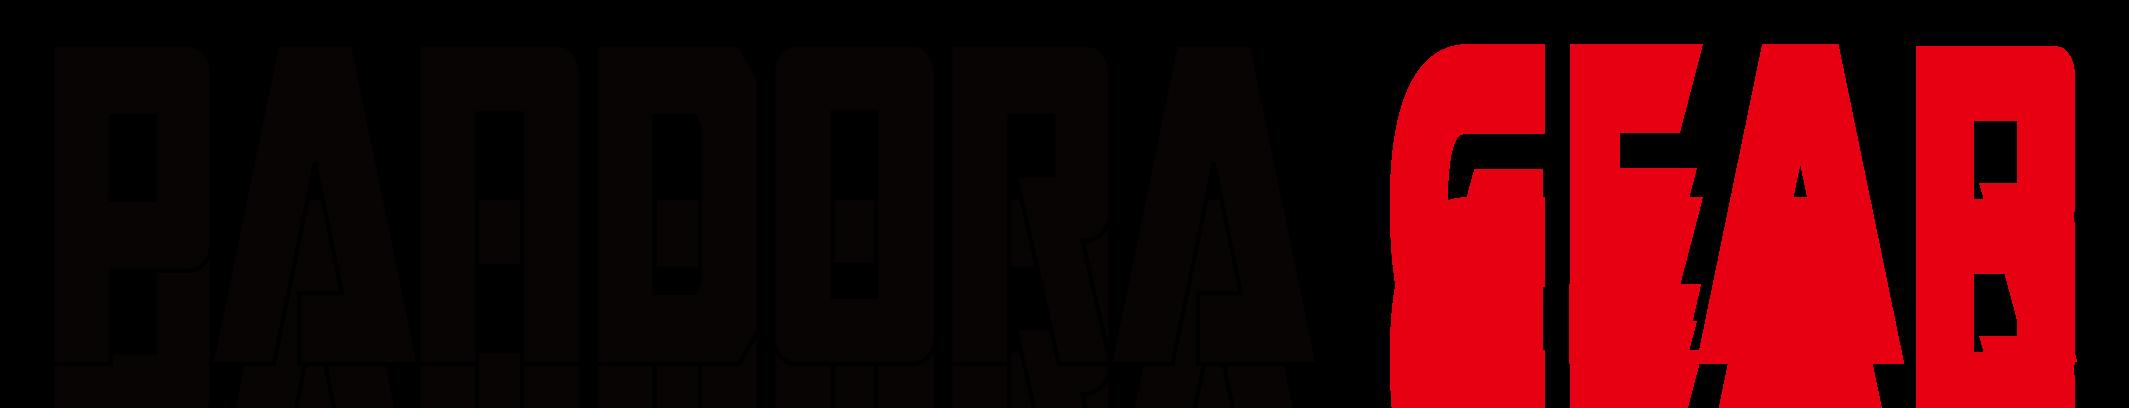 PANDORA GEAR